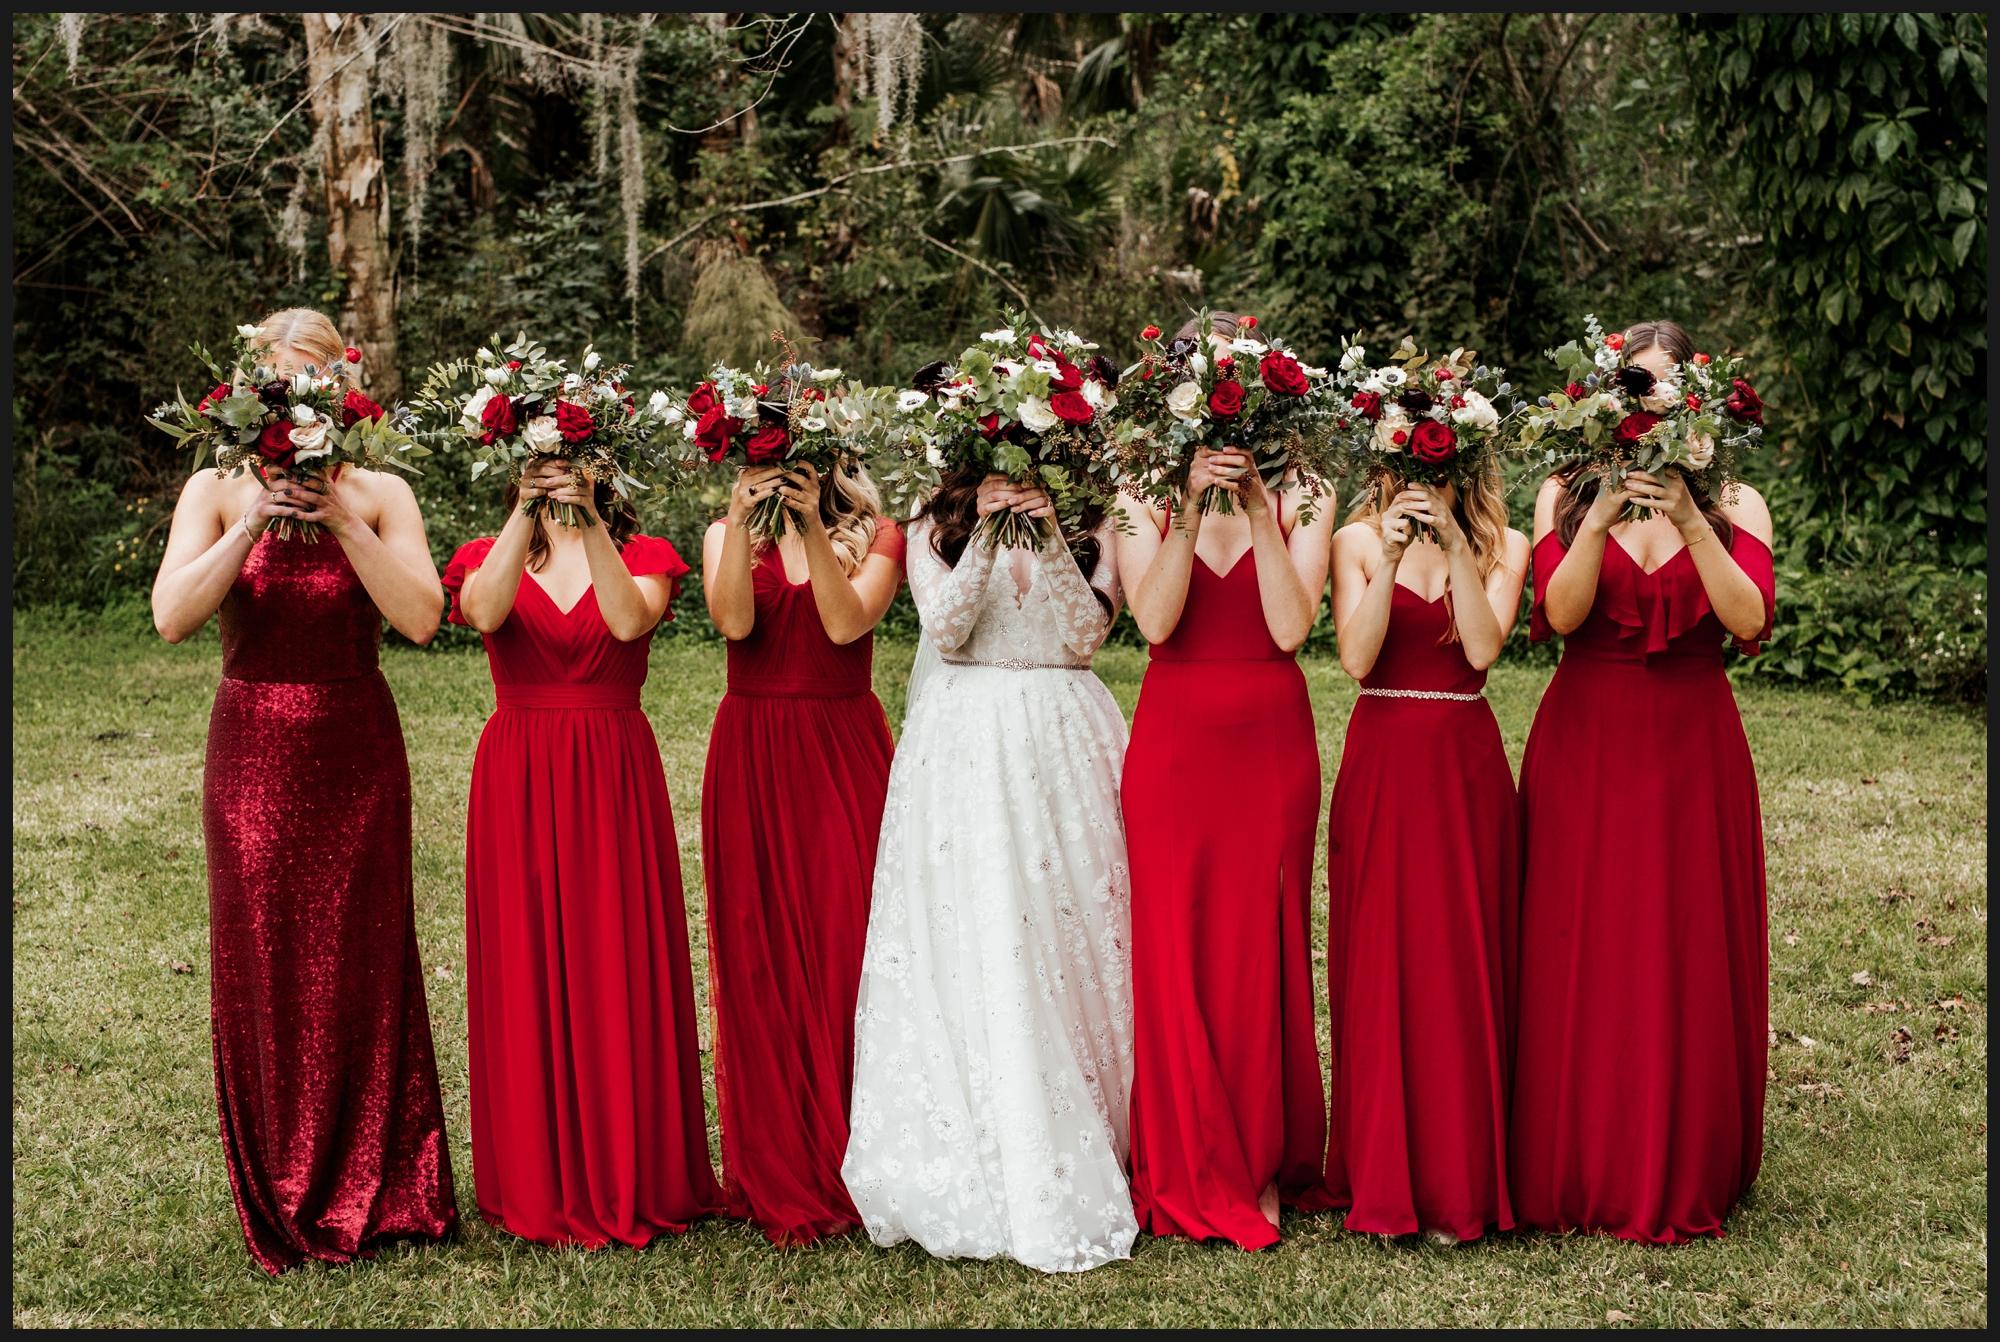 Orlando-Wedding-Photographer-destination-wedding-photographer-florida-wedding-photographer-hawaii-wedding-photographer_0519.jpg